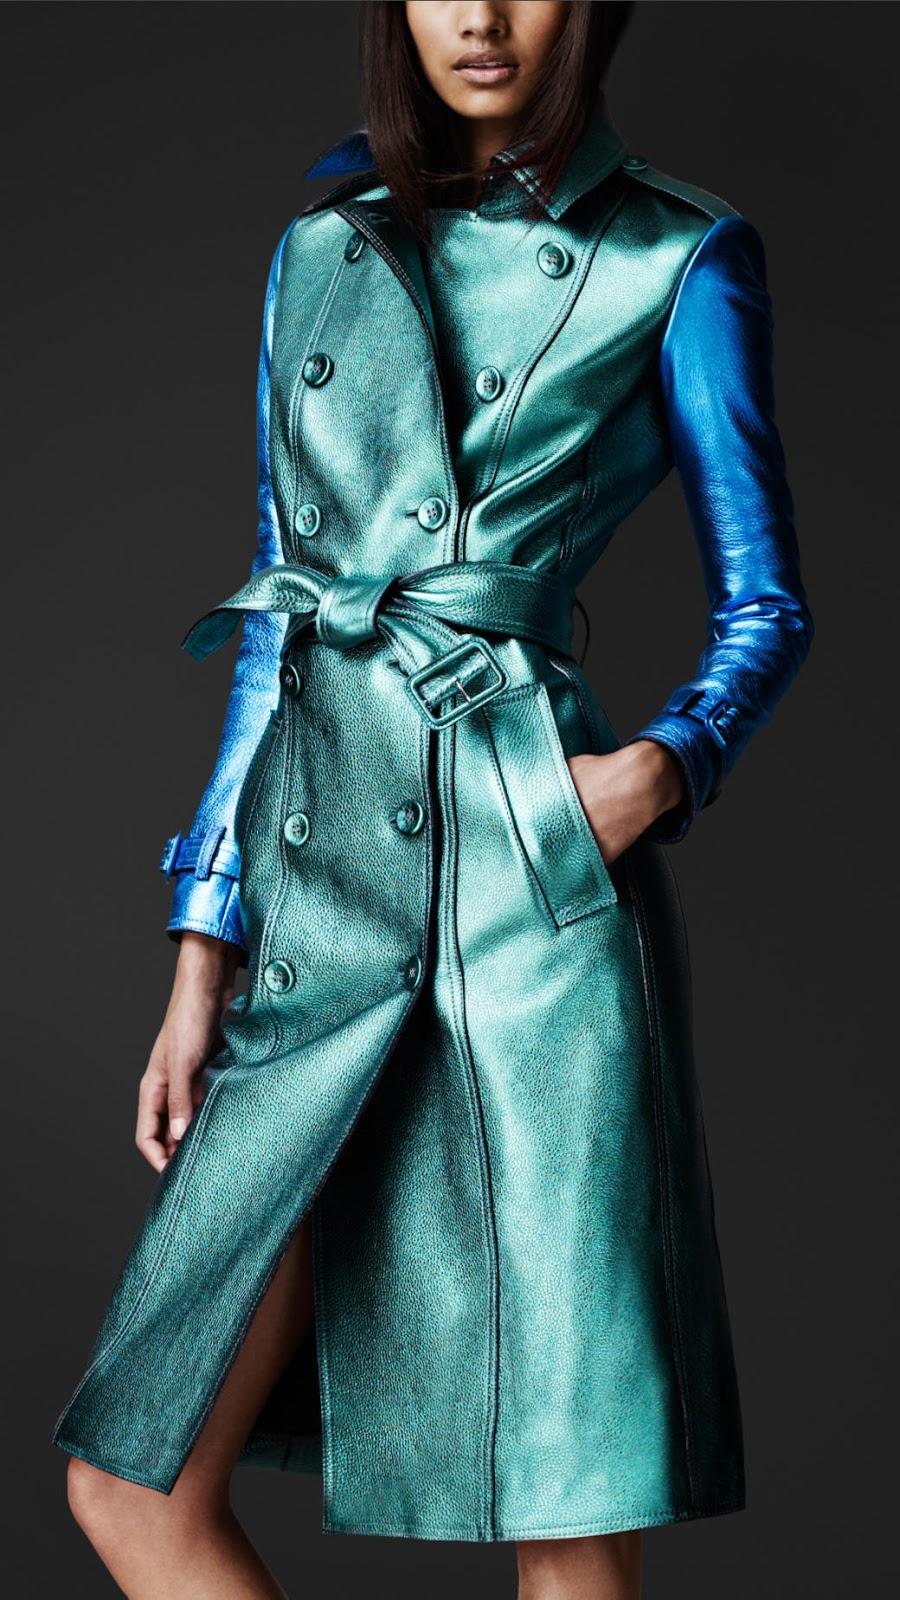 Burberry Prorsum Runway London Fashion Week Aw14: A.k.a. Oniomania: In My Dreams...Burberry Prorsum Metallic